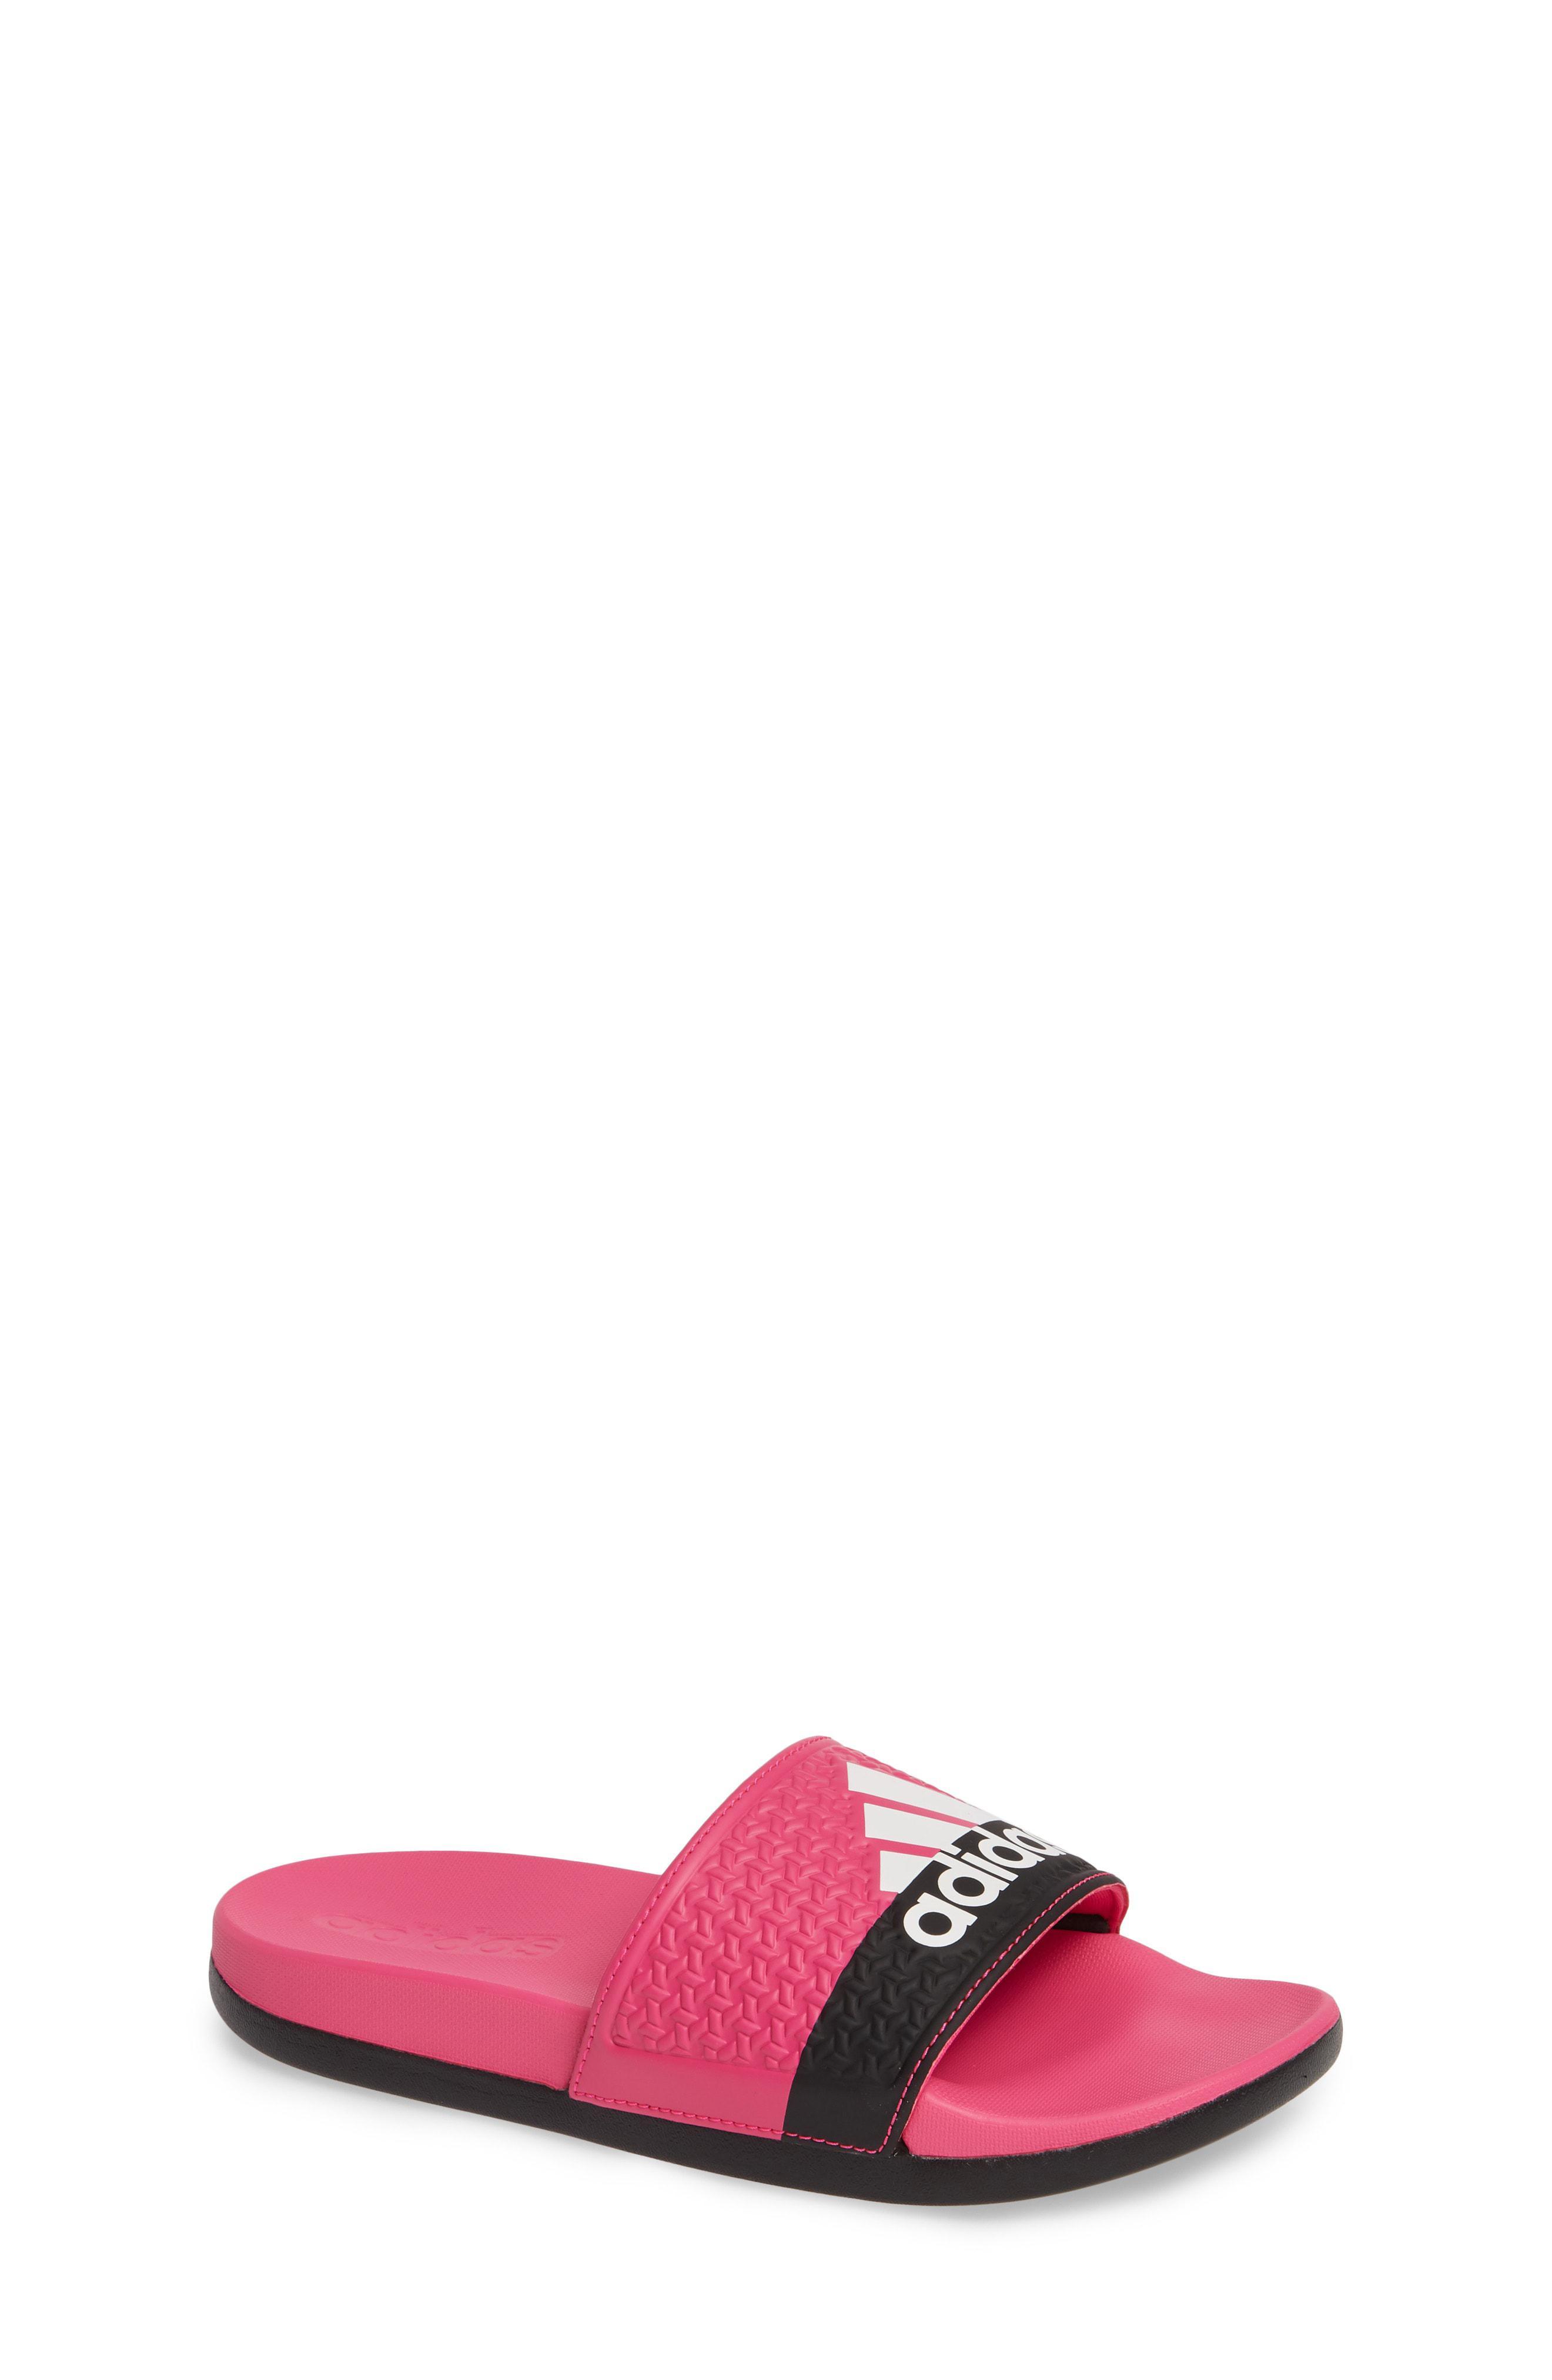 11b6f2ad257 adidas. Women s Adilette Cf K Sport Slide